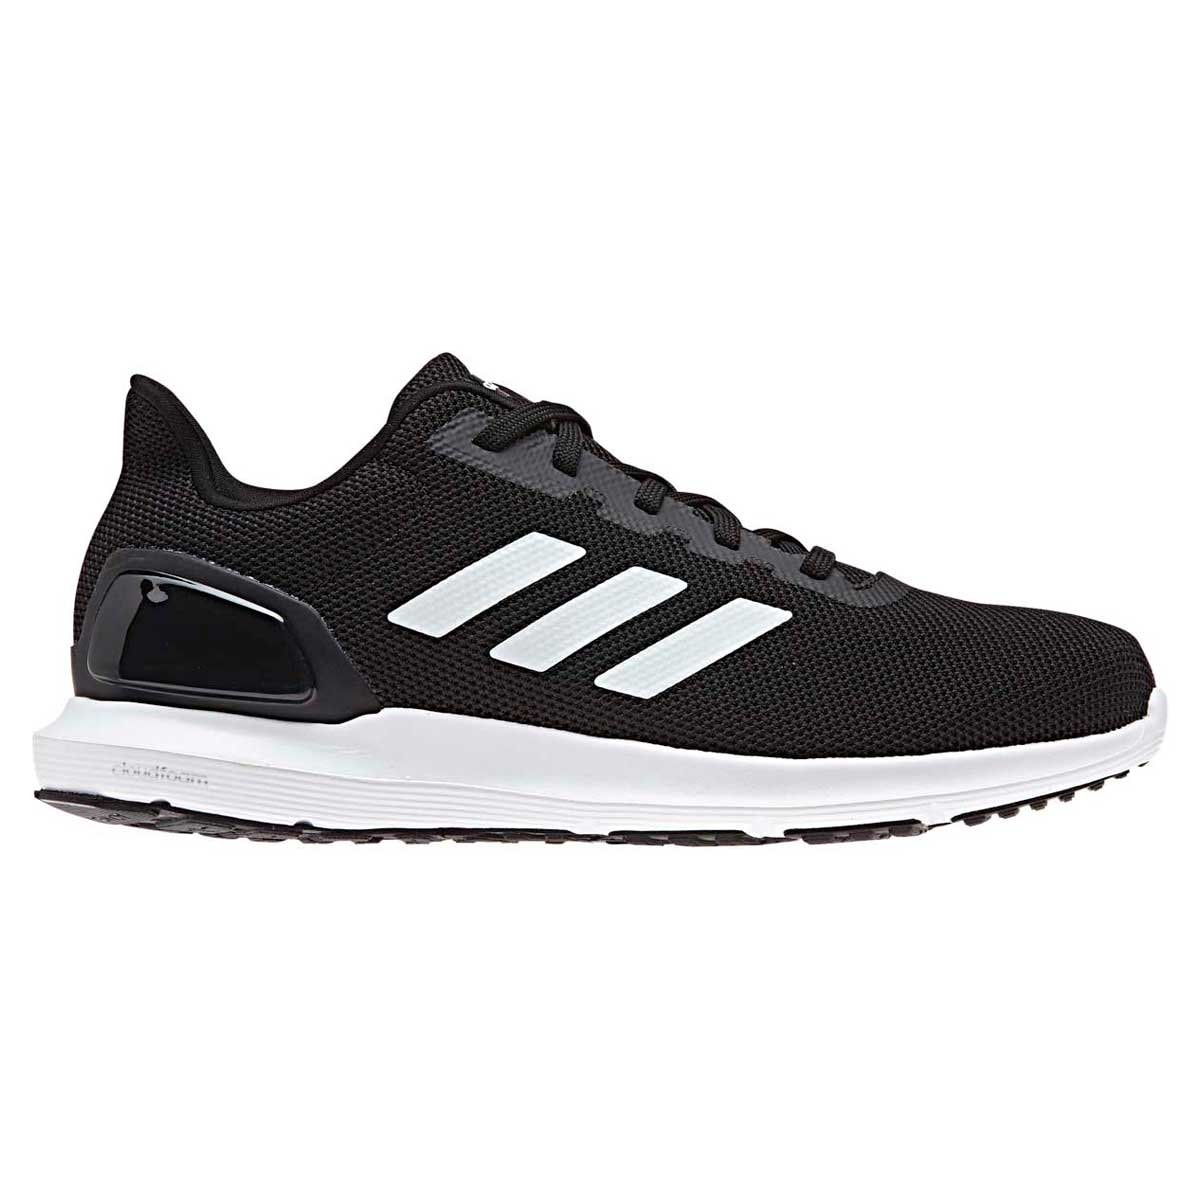 Tenis Running Cosmic 2 Negro Adidas - Caballero